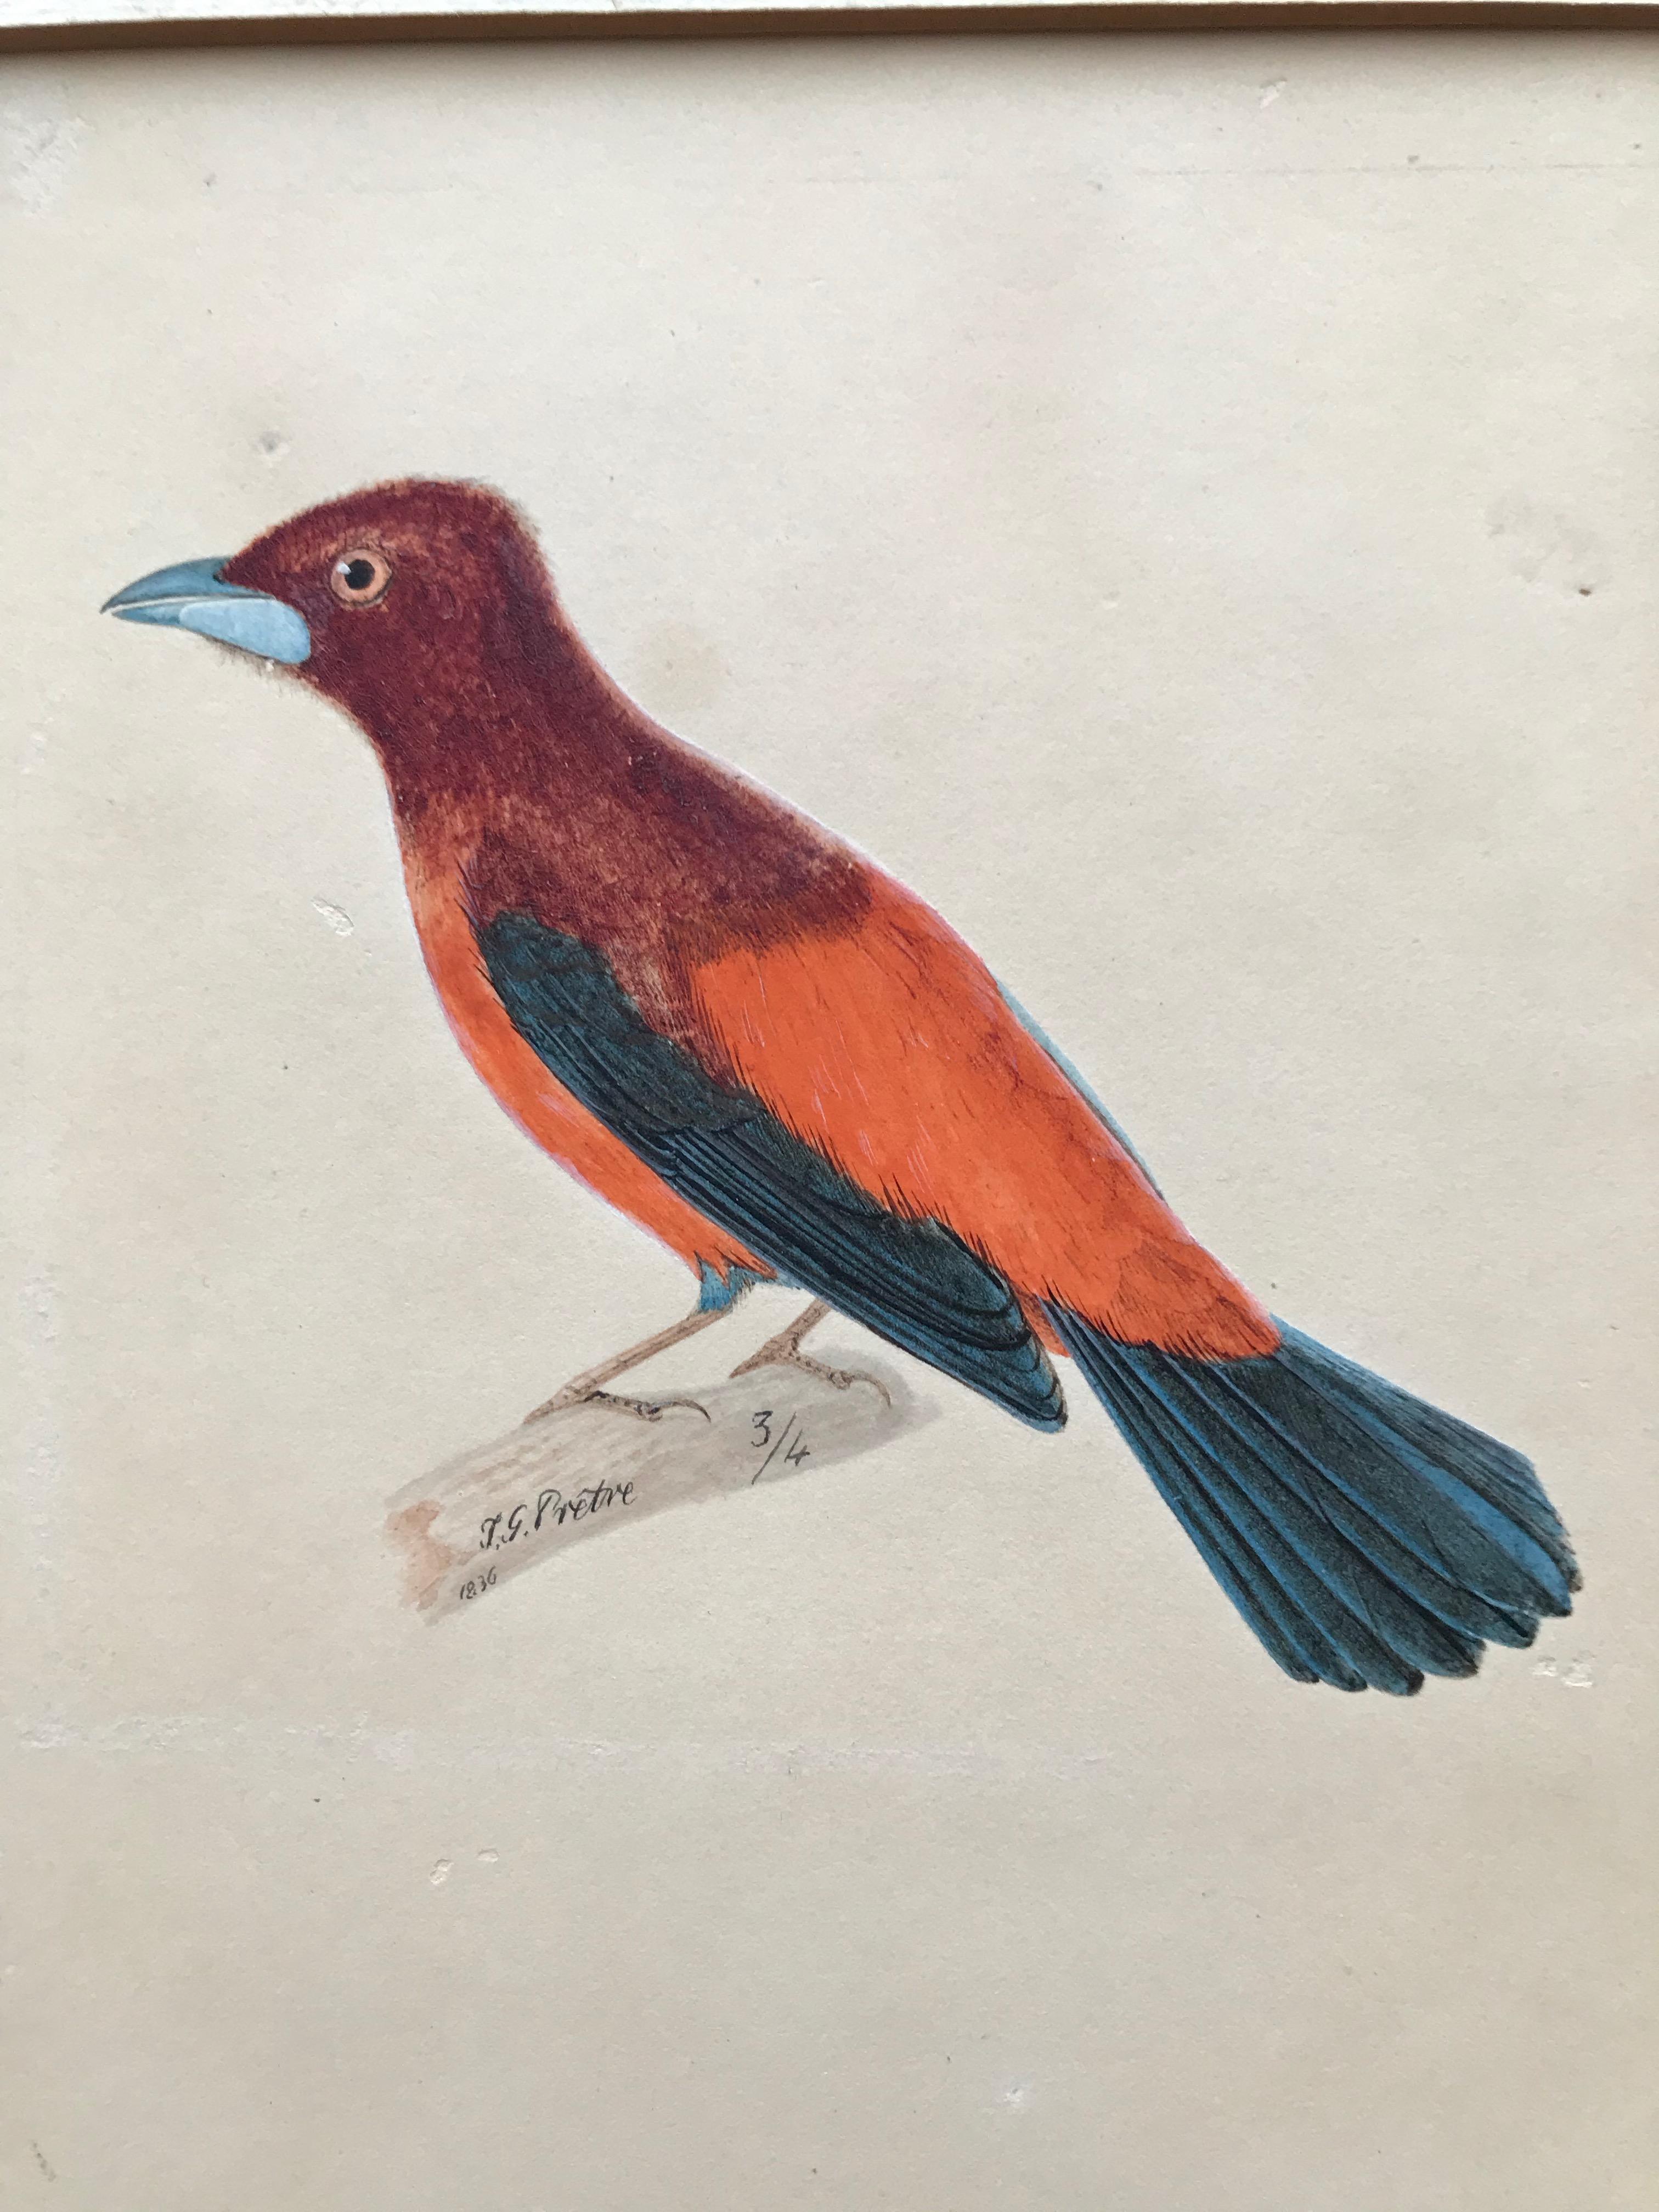 Jean Gabriel Pretre, Early 19th Century watercolor of Exotic bird, Swiss artist